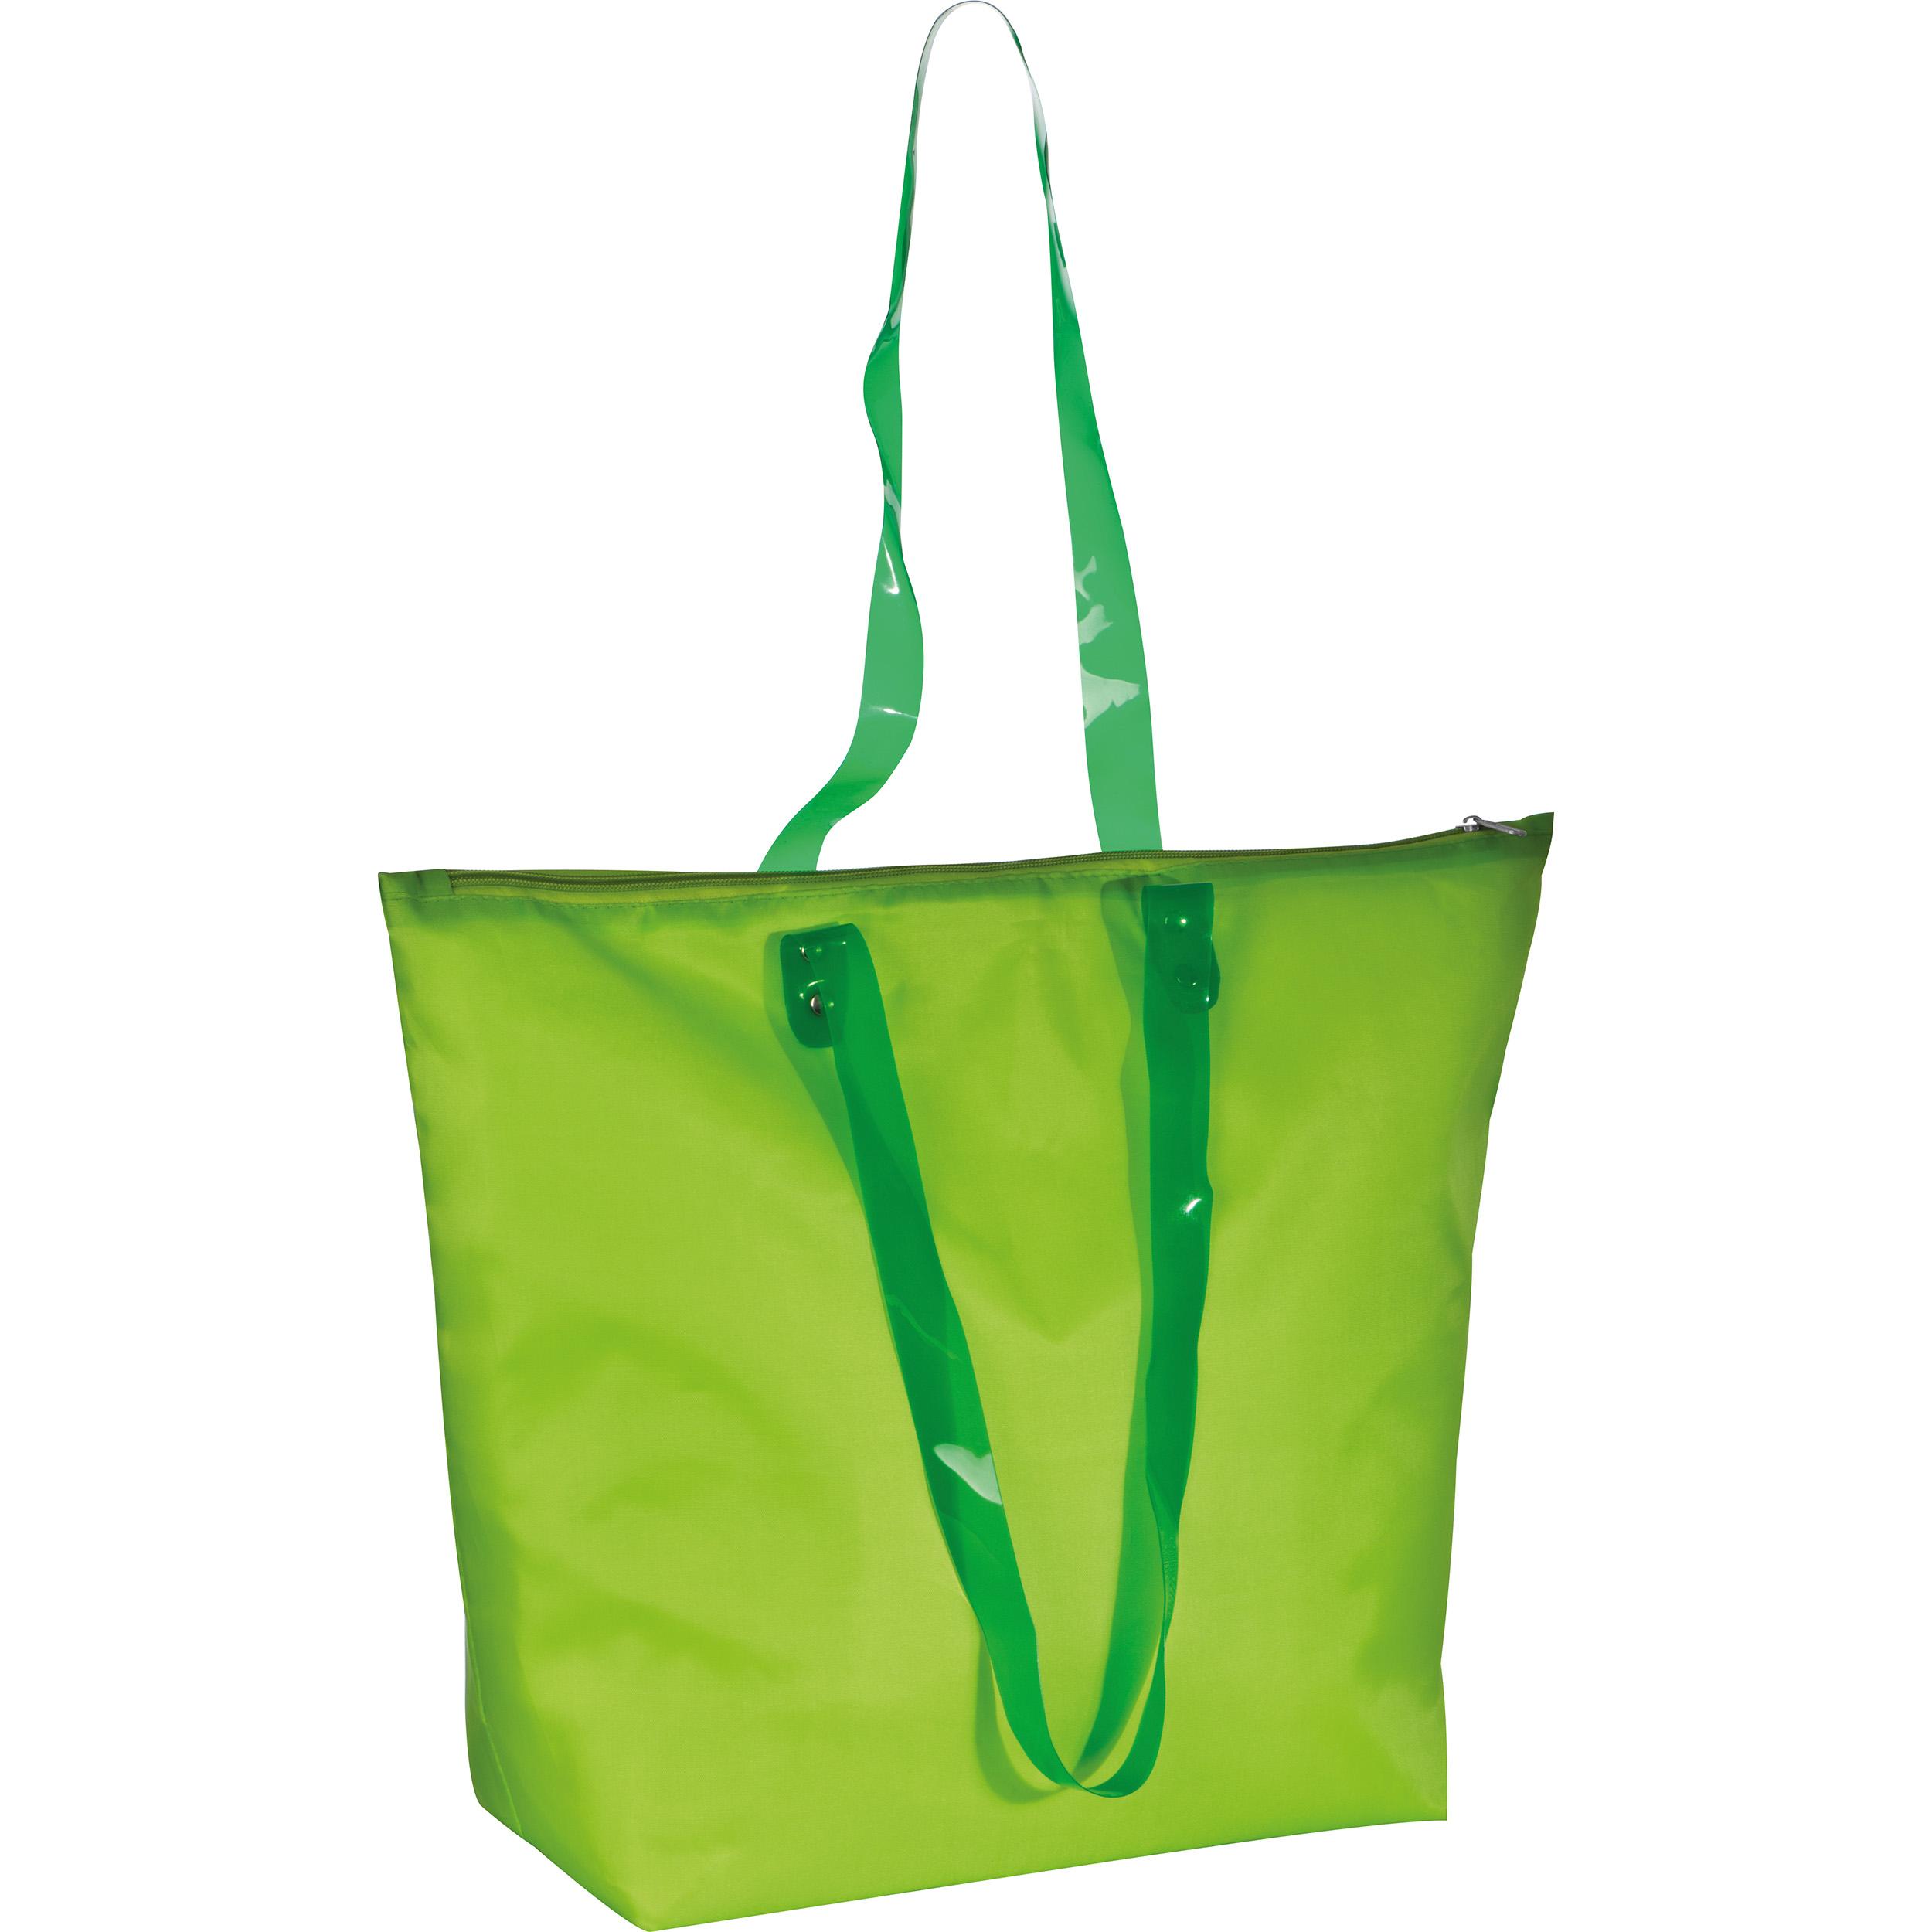 Beach bag with transparent handles